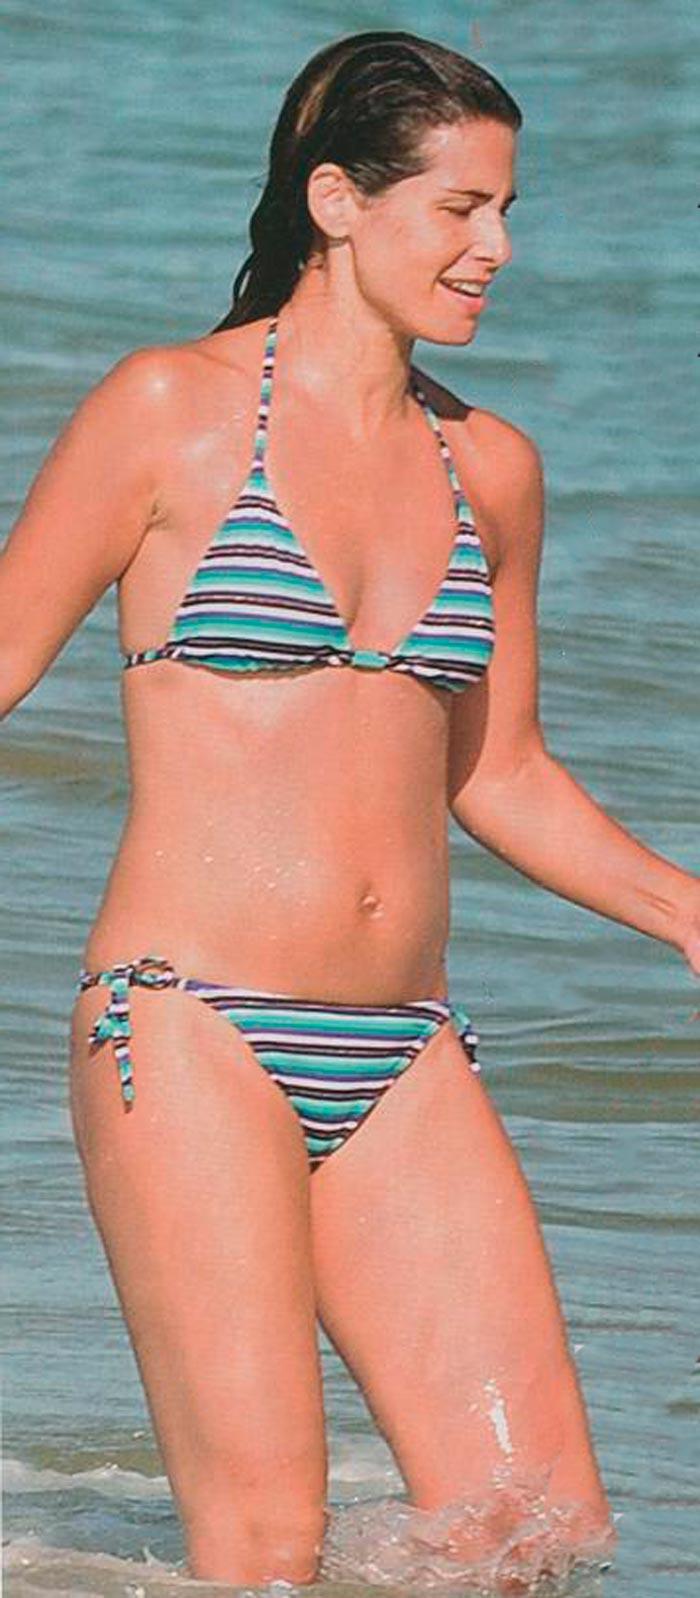 Nuria Roca Presentadora Valenciana Televisión Fotos Bikini 5